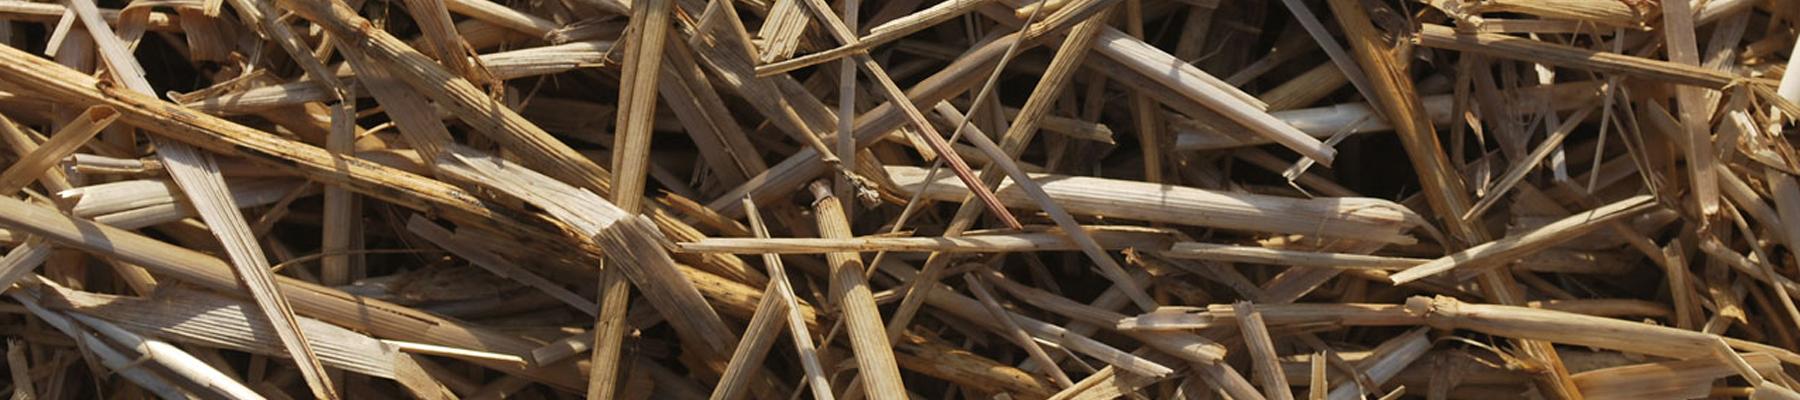 Biomass-fuels6